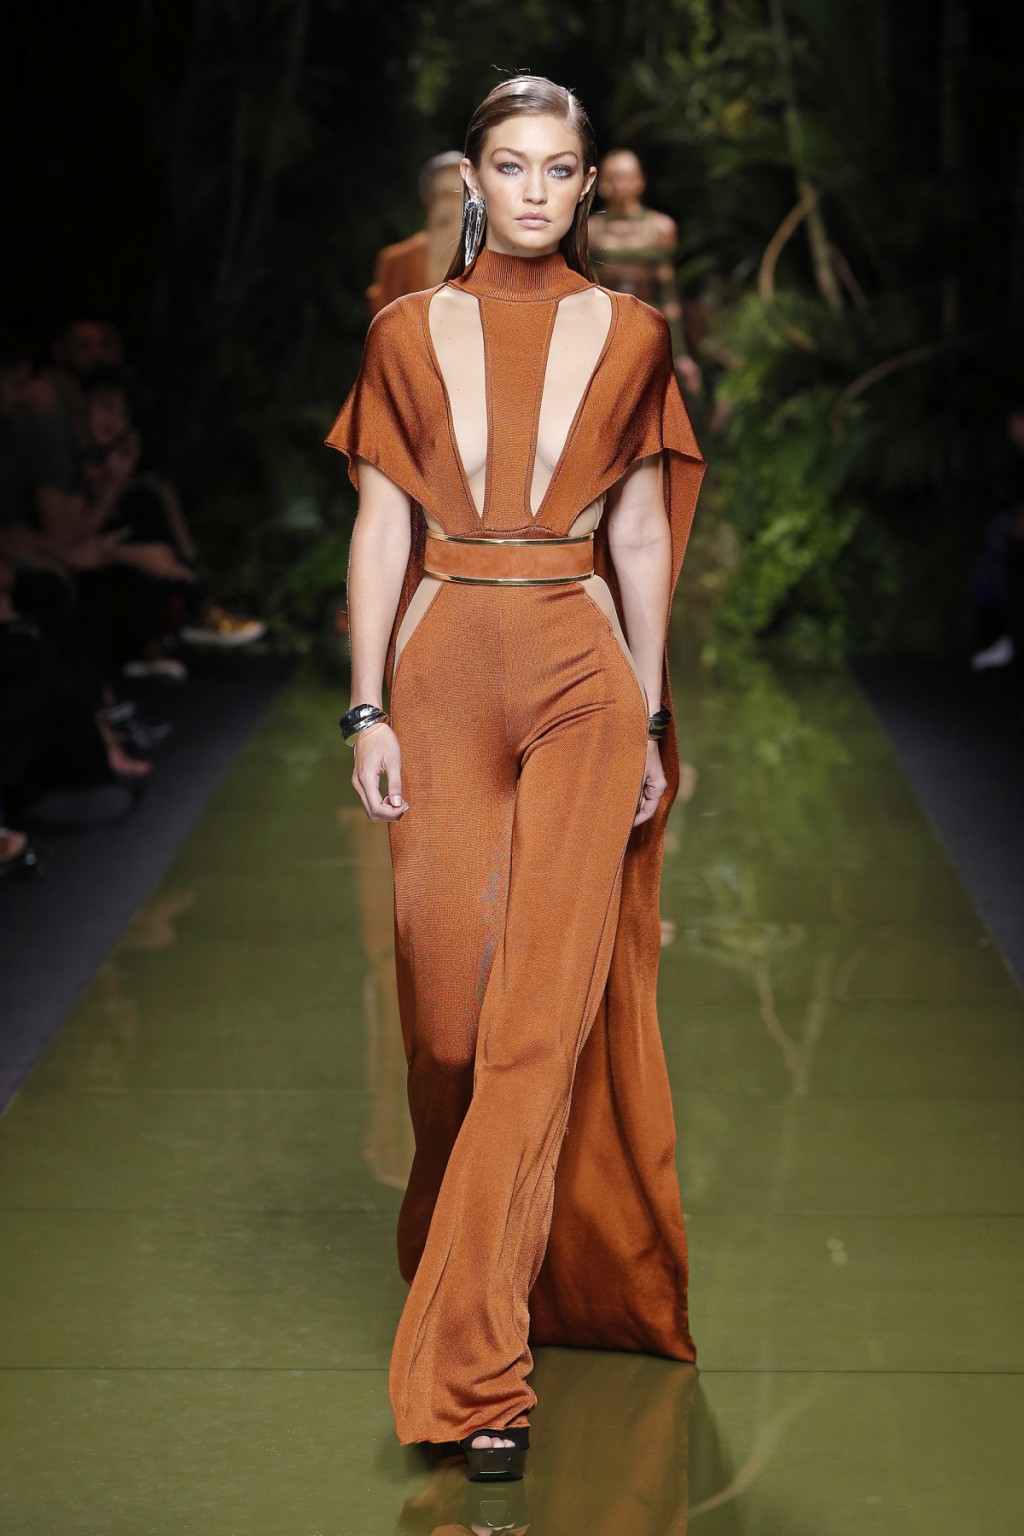 Gigi Hadid trong thiết kế jumpsuits cutout táo bạo từ Balmain